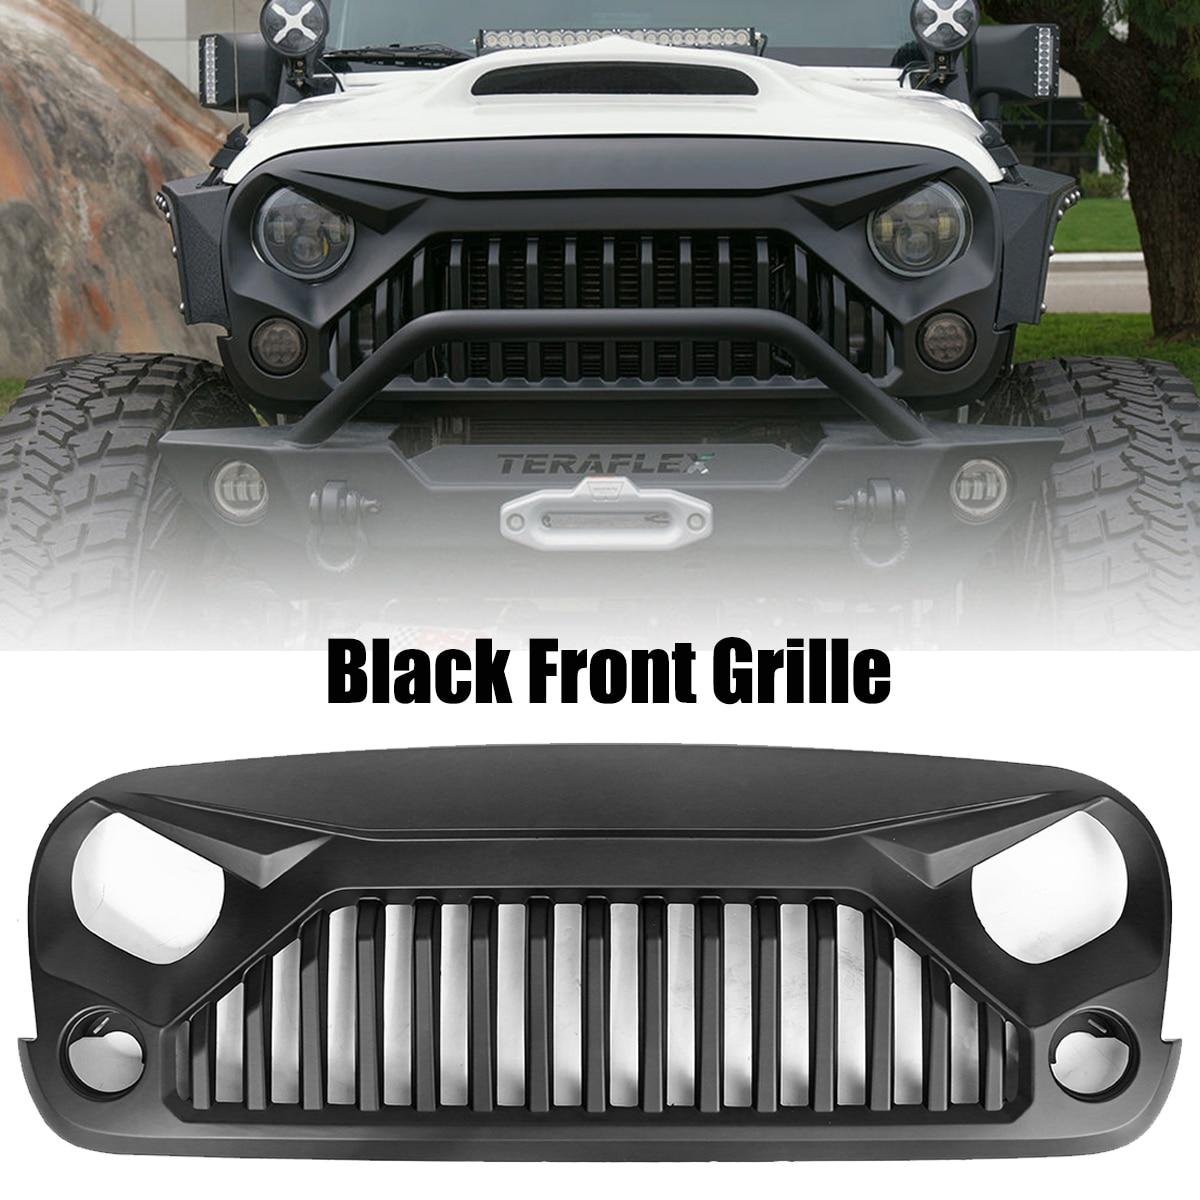 Insert Mesh Bumper Grille Circle Front Auto Grills for 07-17 J eep W rangler JK V2 Front Hood Grille Car Black Racing Grills